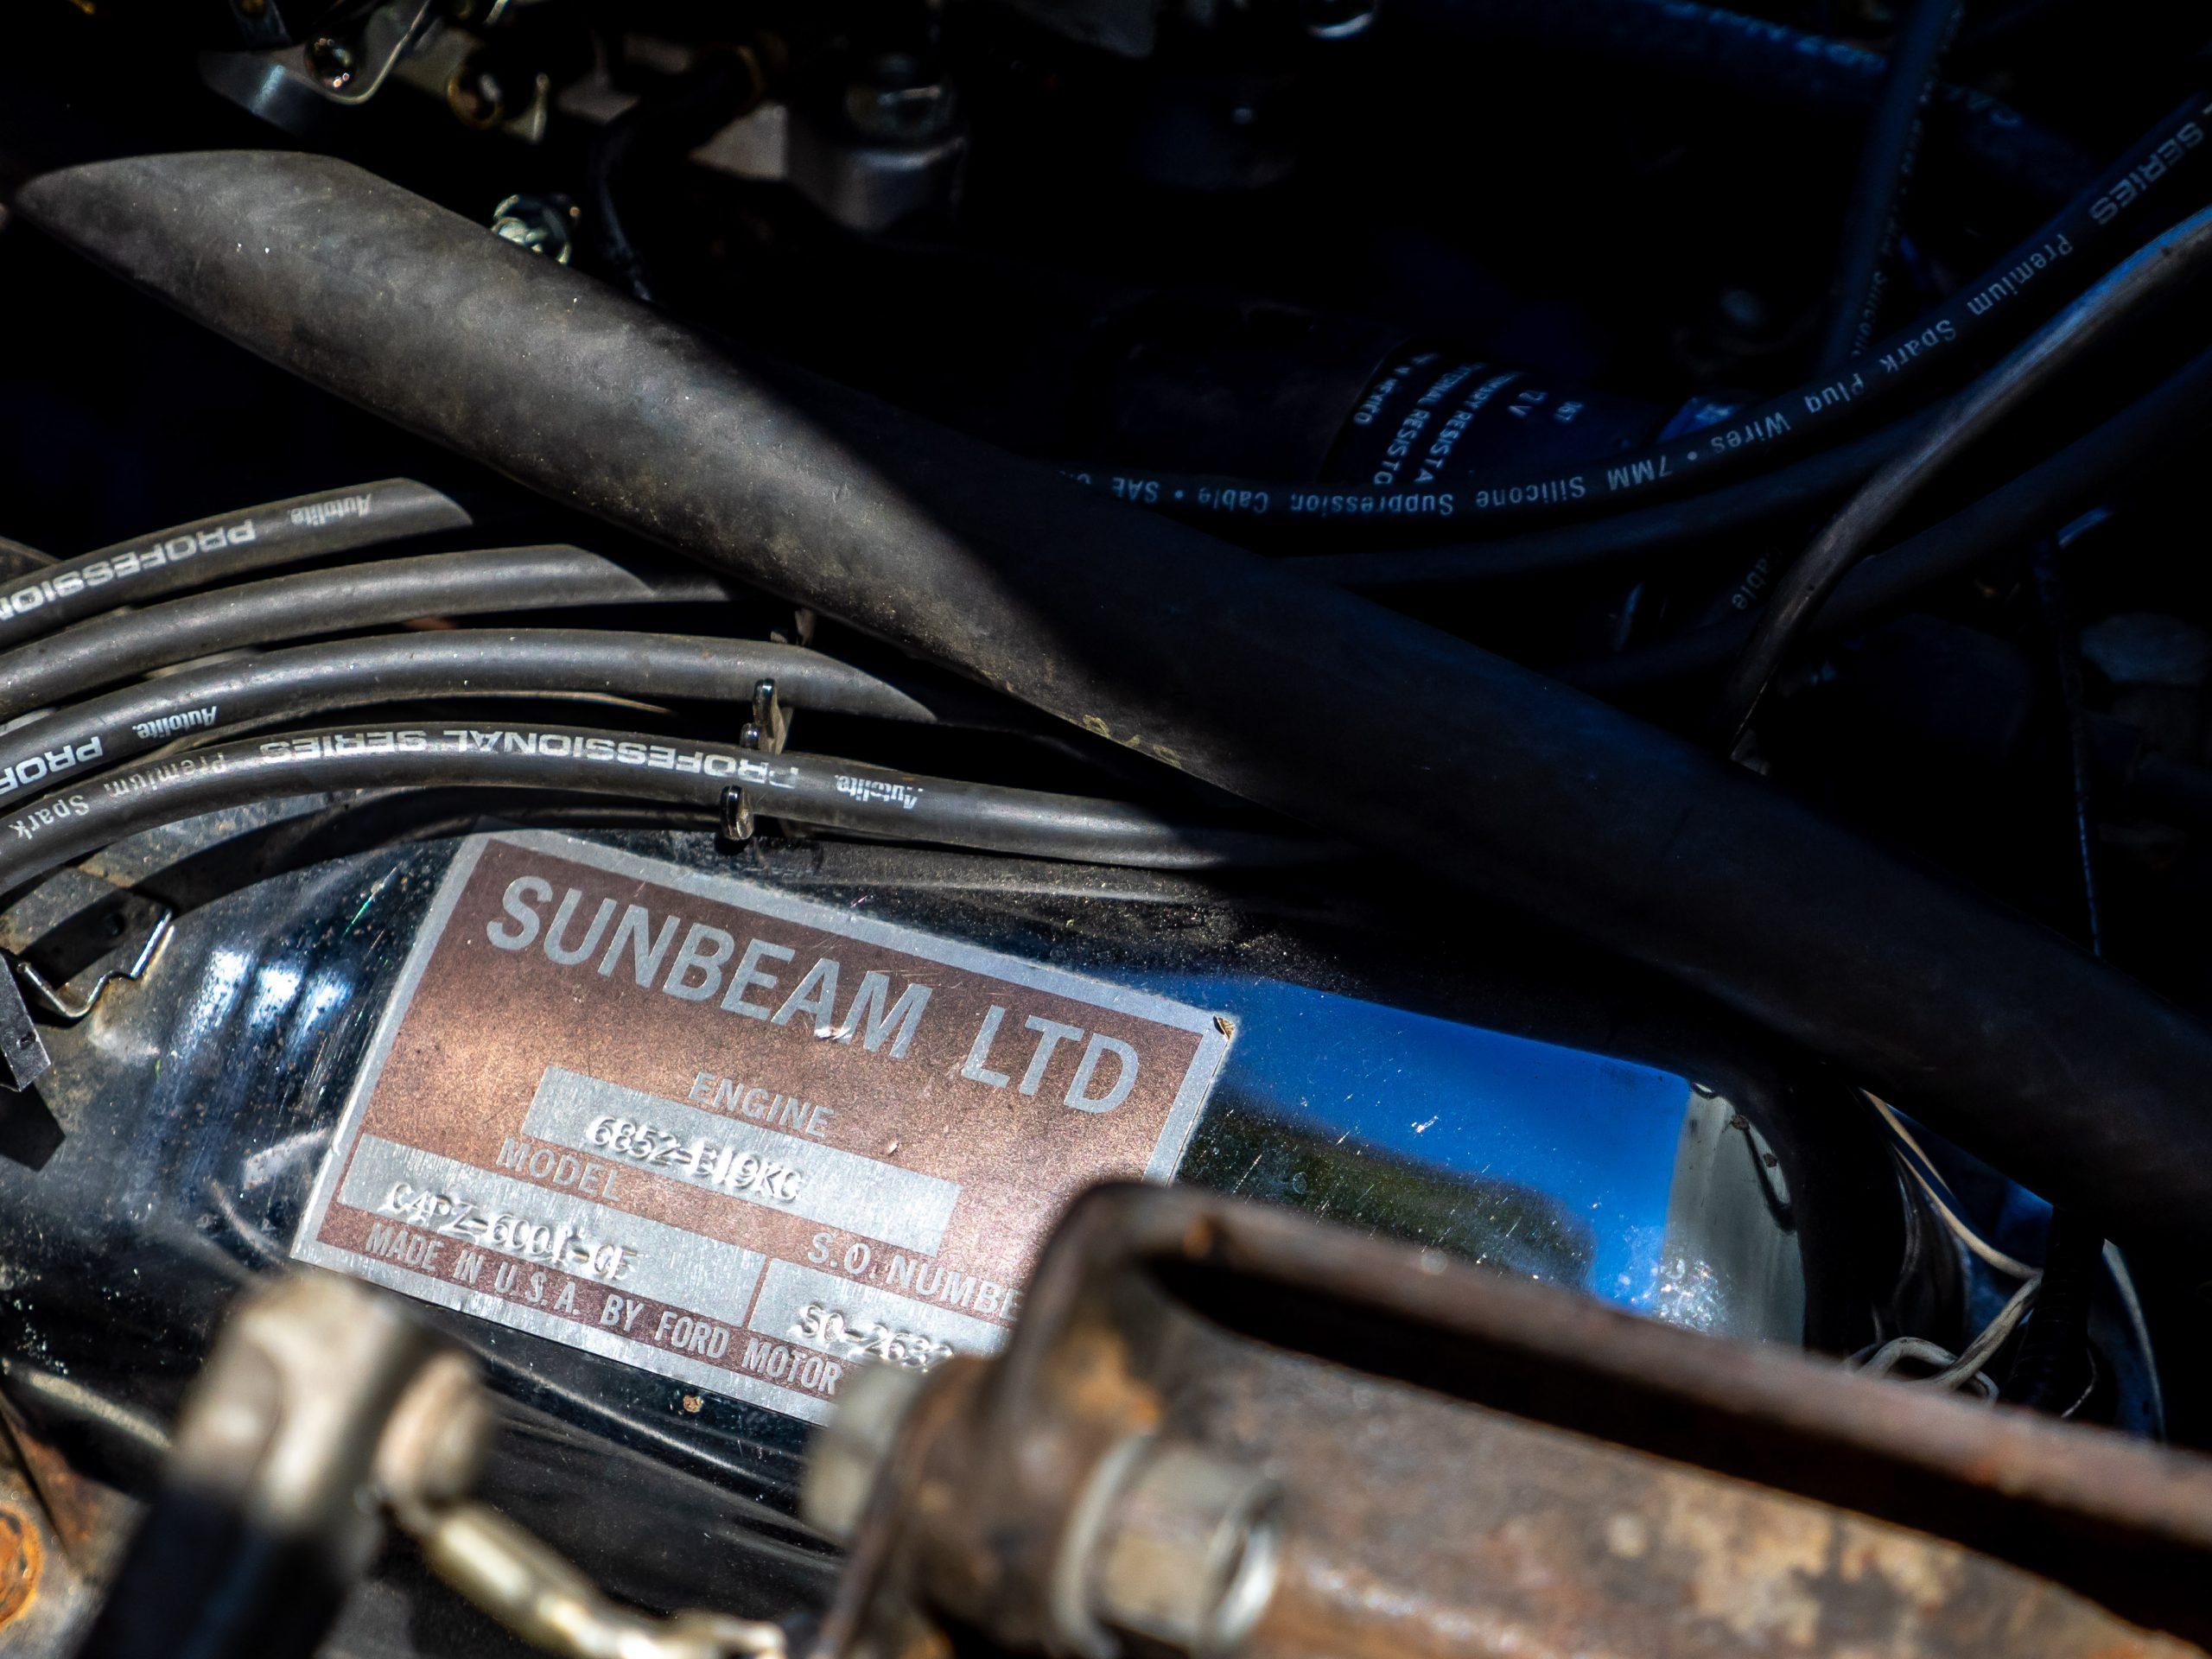 Sunbeam Tiger Engine Model